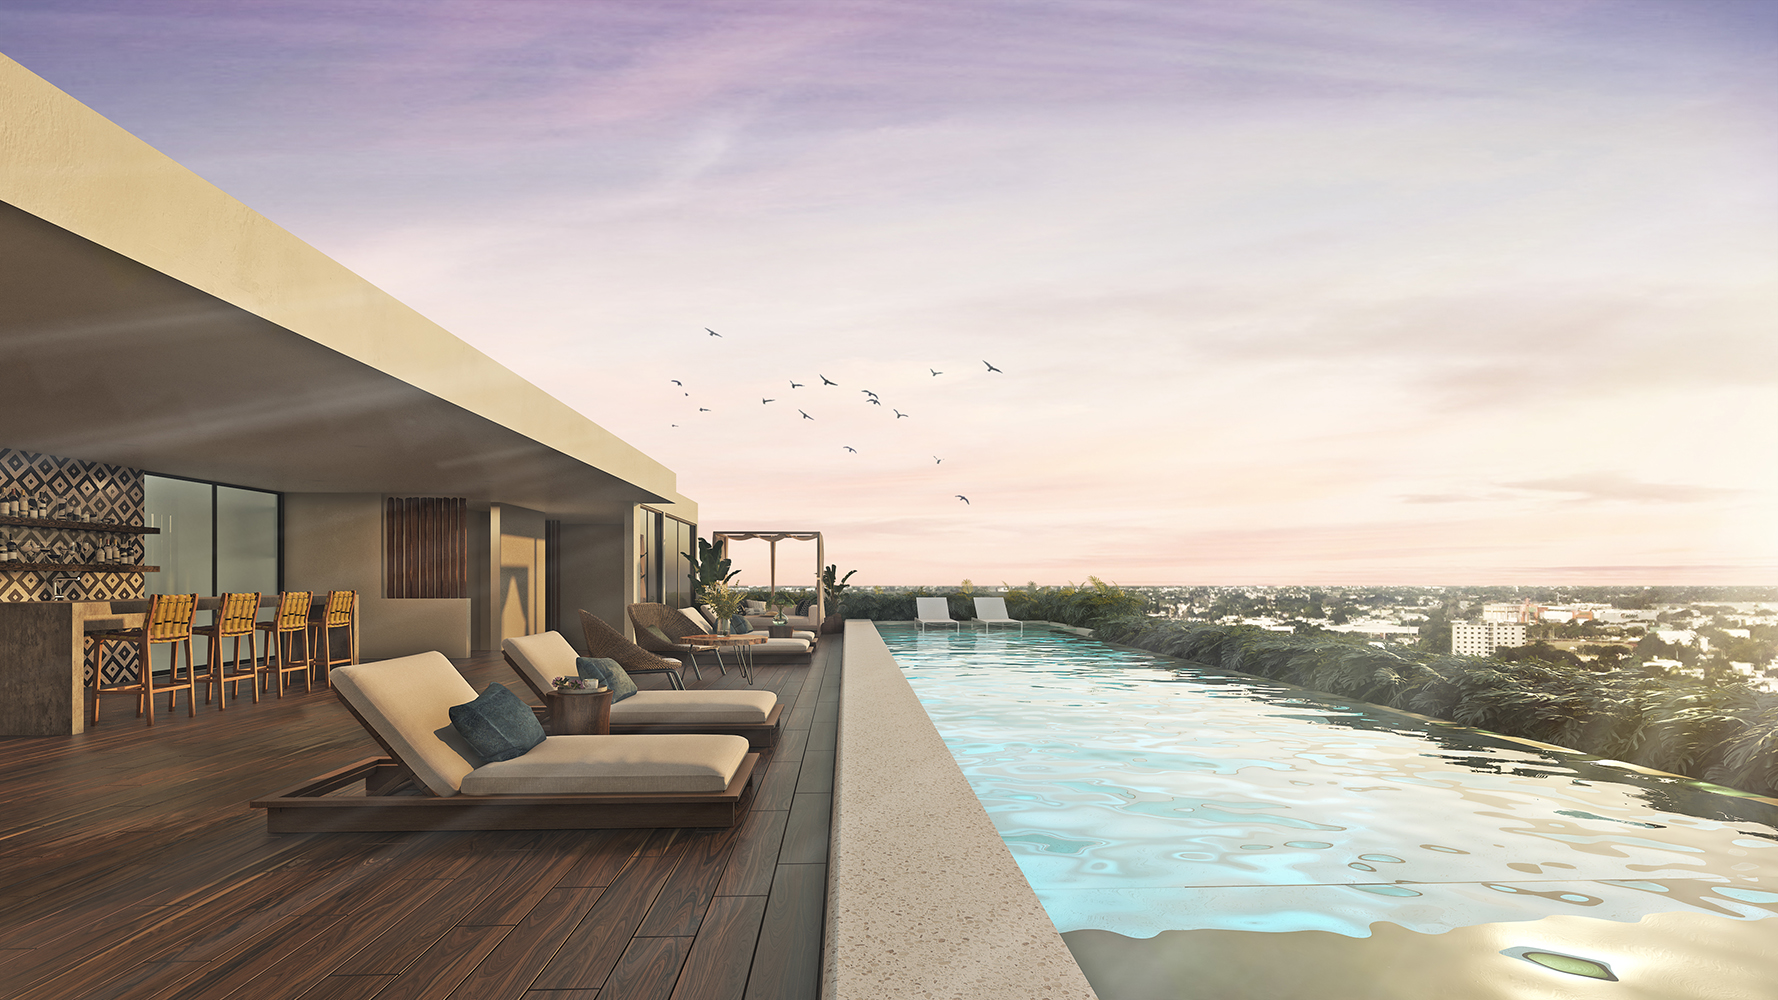 PISCINA 1- Paravian - Pelicano Properties - playa del Carmen